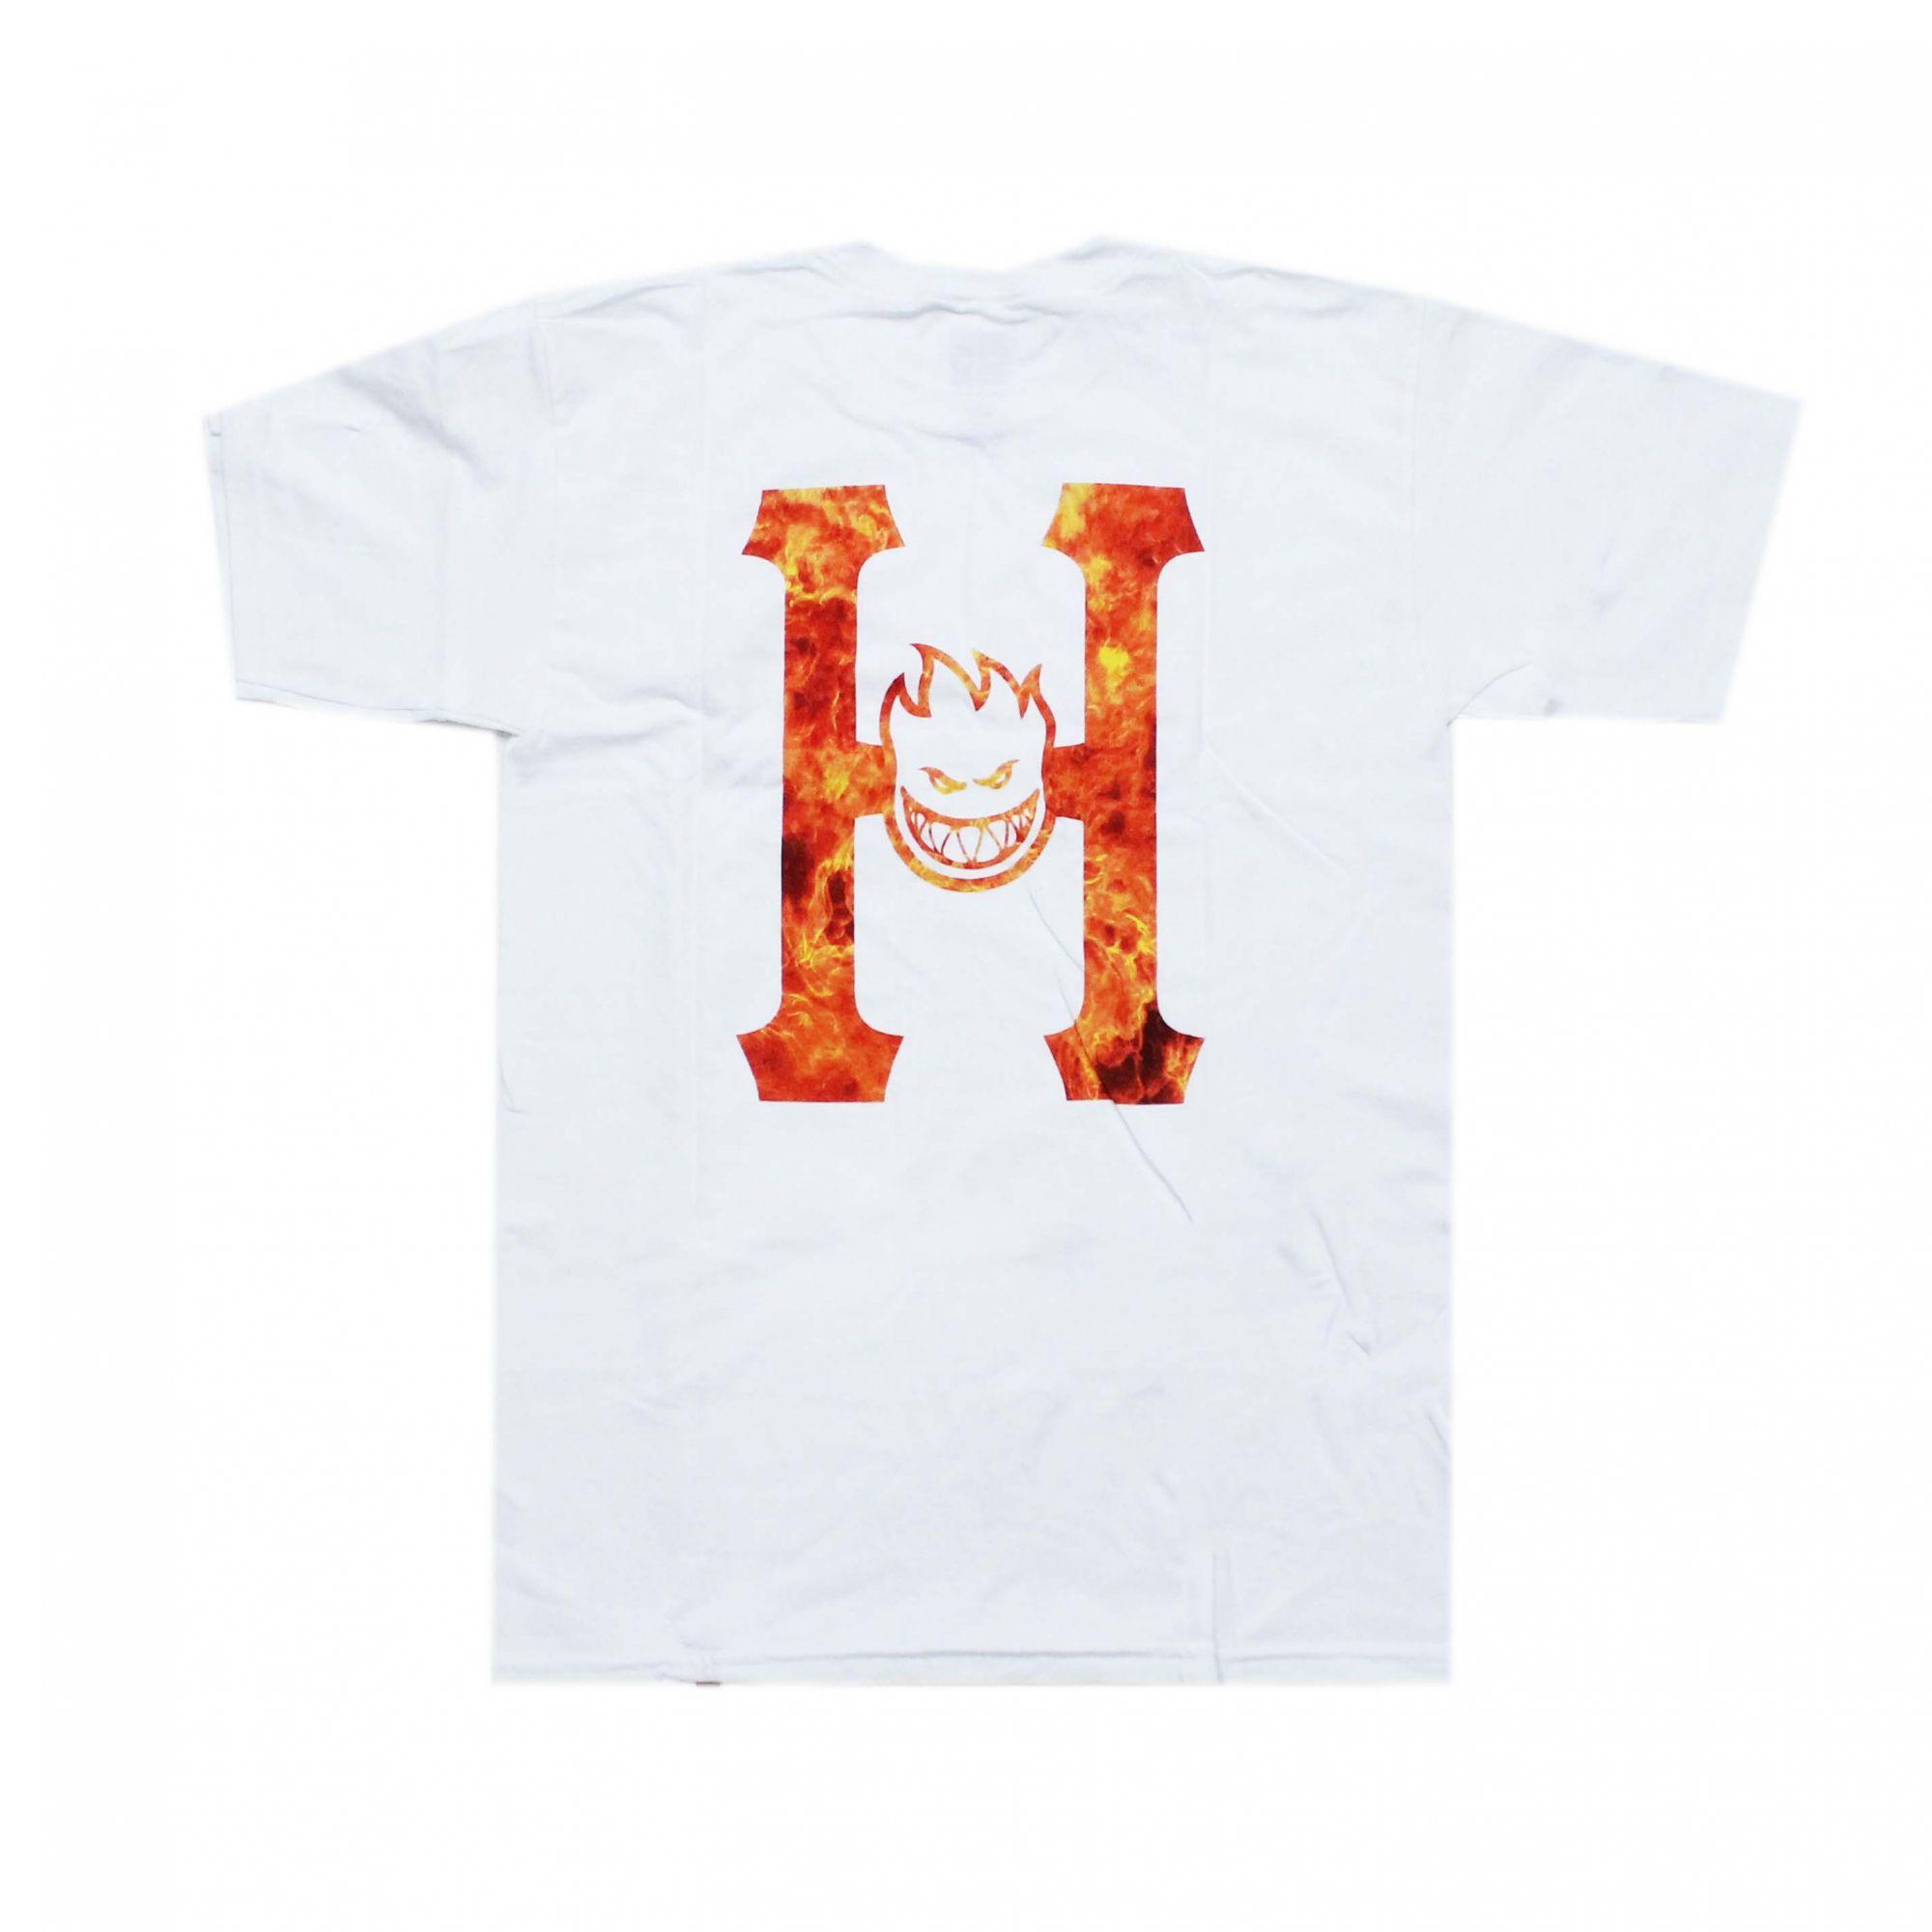 Camiseta HUF x Spitfire Flaming - Branco (Importado)